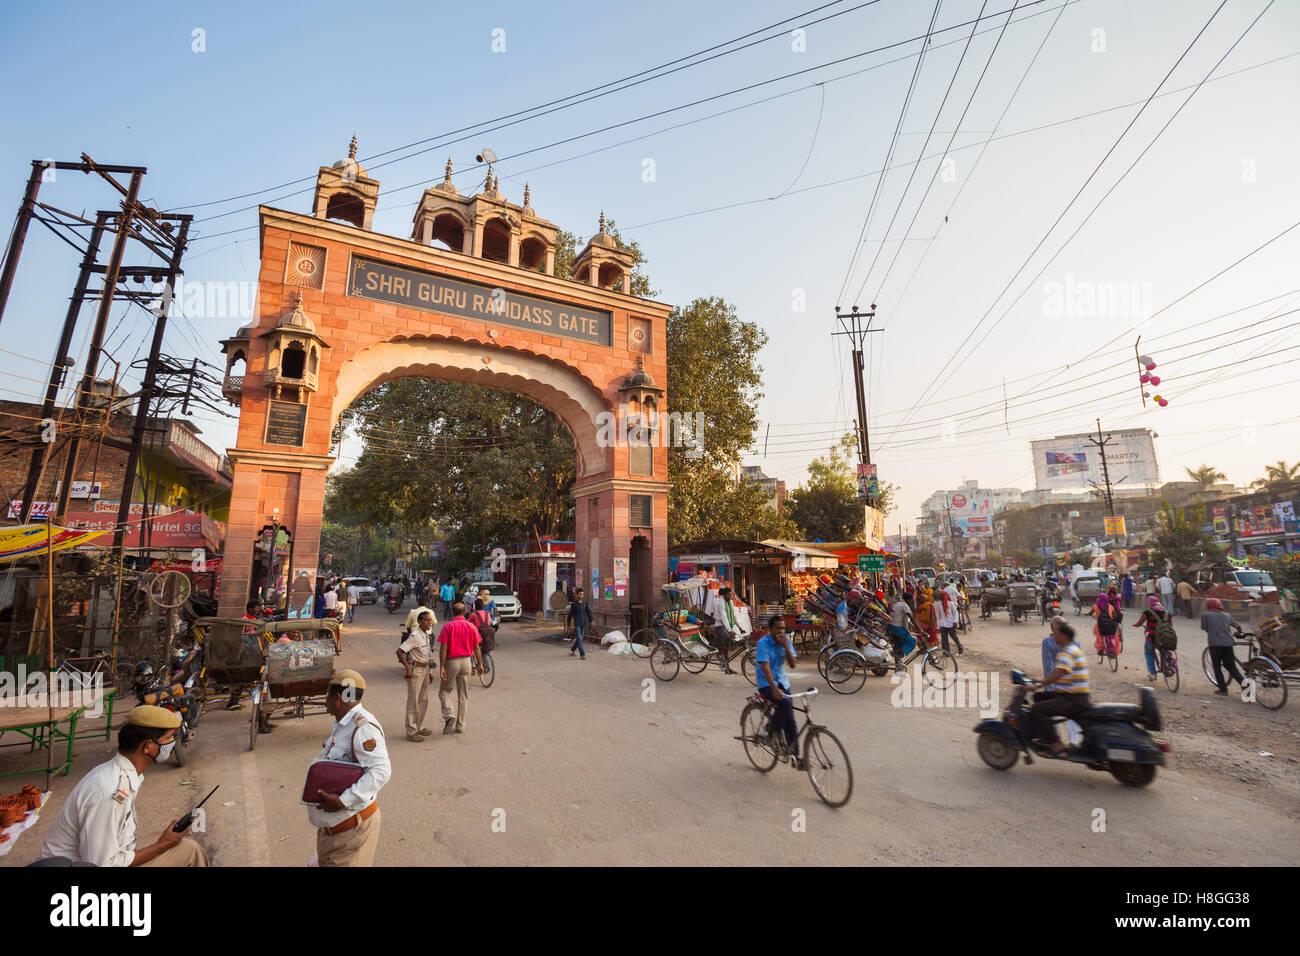 Traffic speeds through the Shri Guru Ravidass Gate - Stock Image